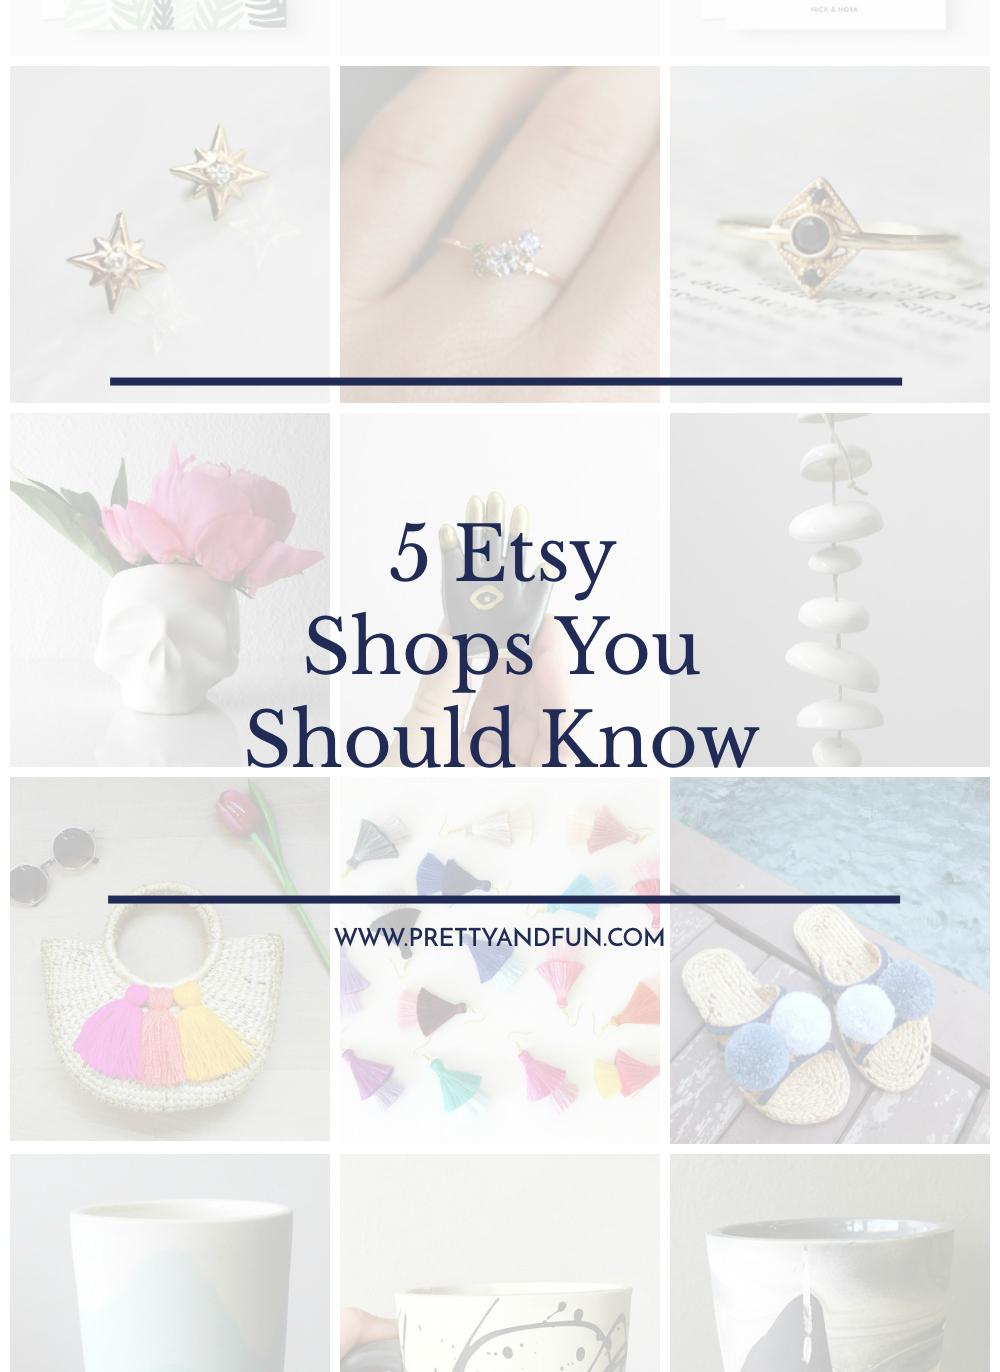 Best Etsy Shops | 5 Shops You Should Know | Pretty & Fun